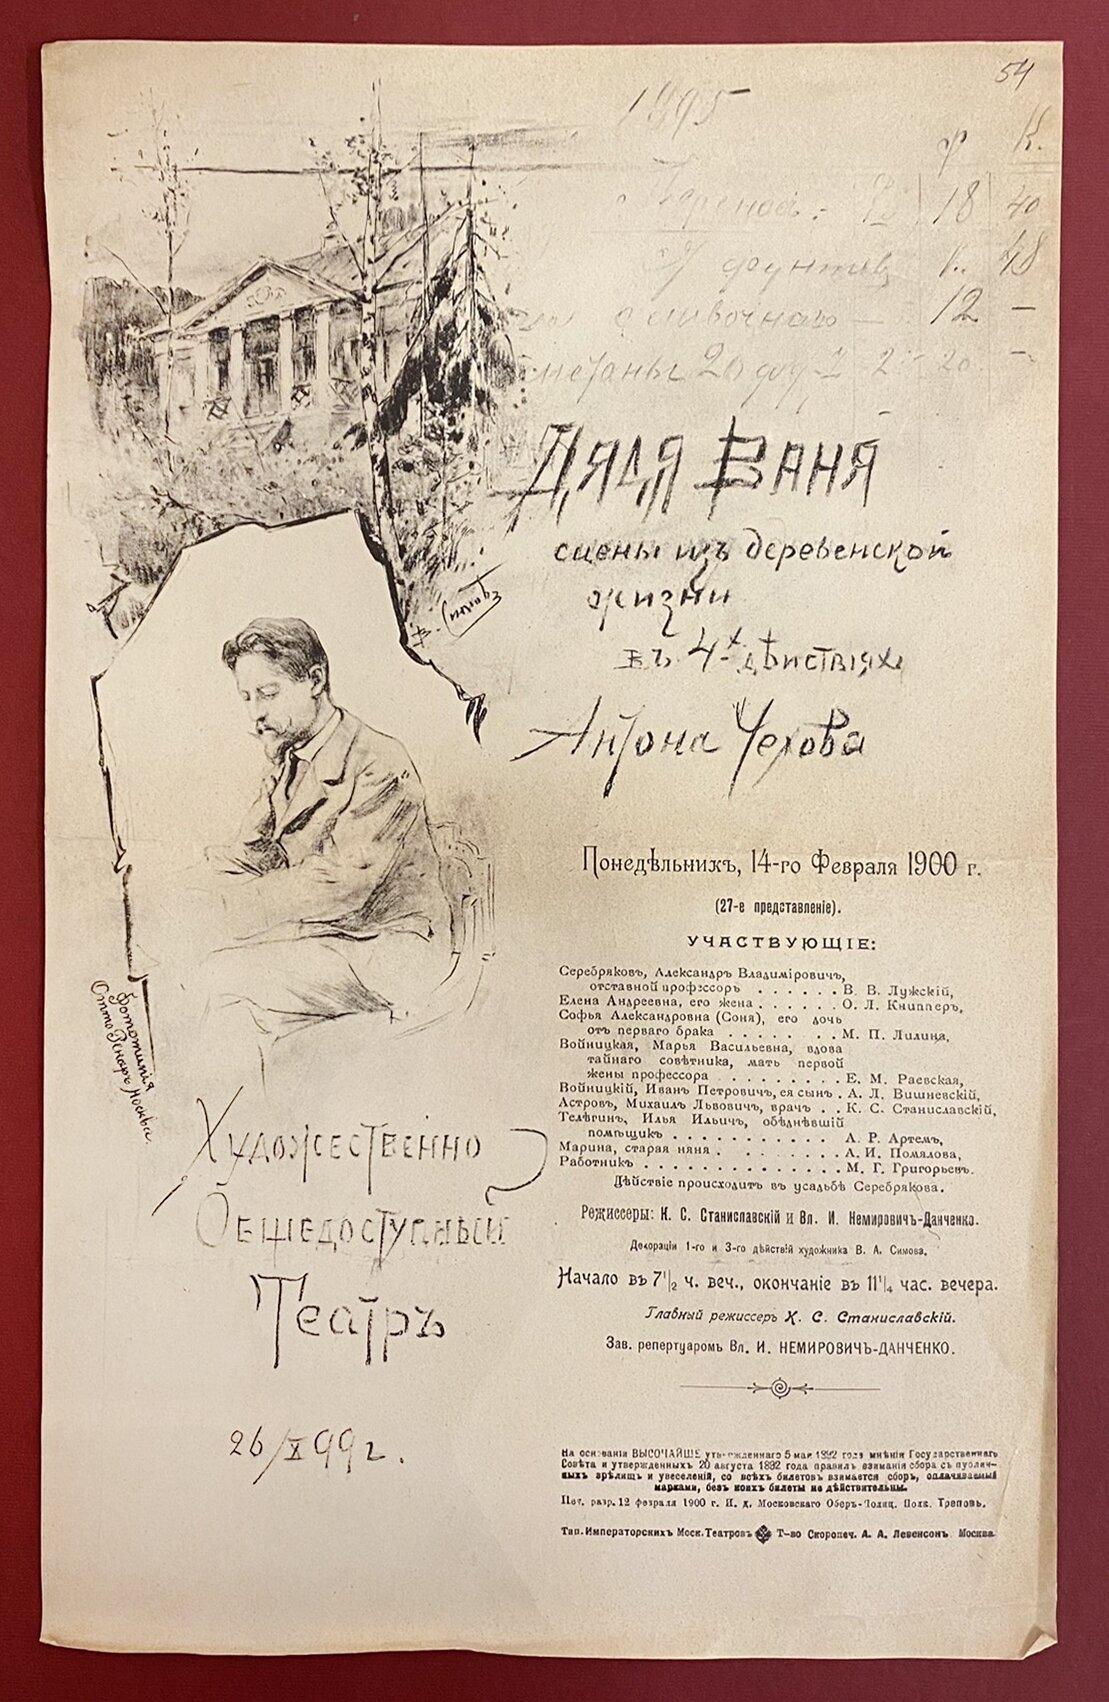 Афиша спектакля «Дядя Ваня». 1899 год. Главархив Москвы